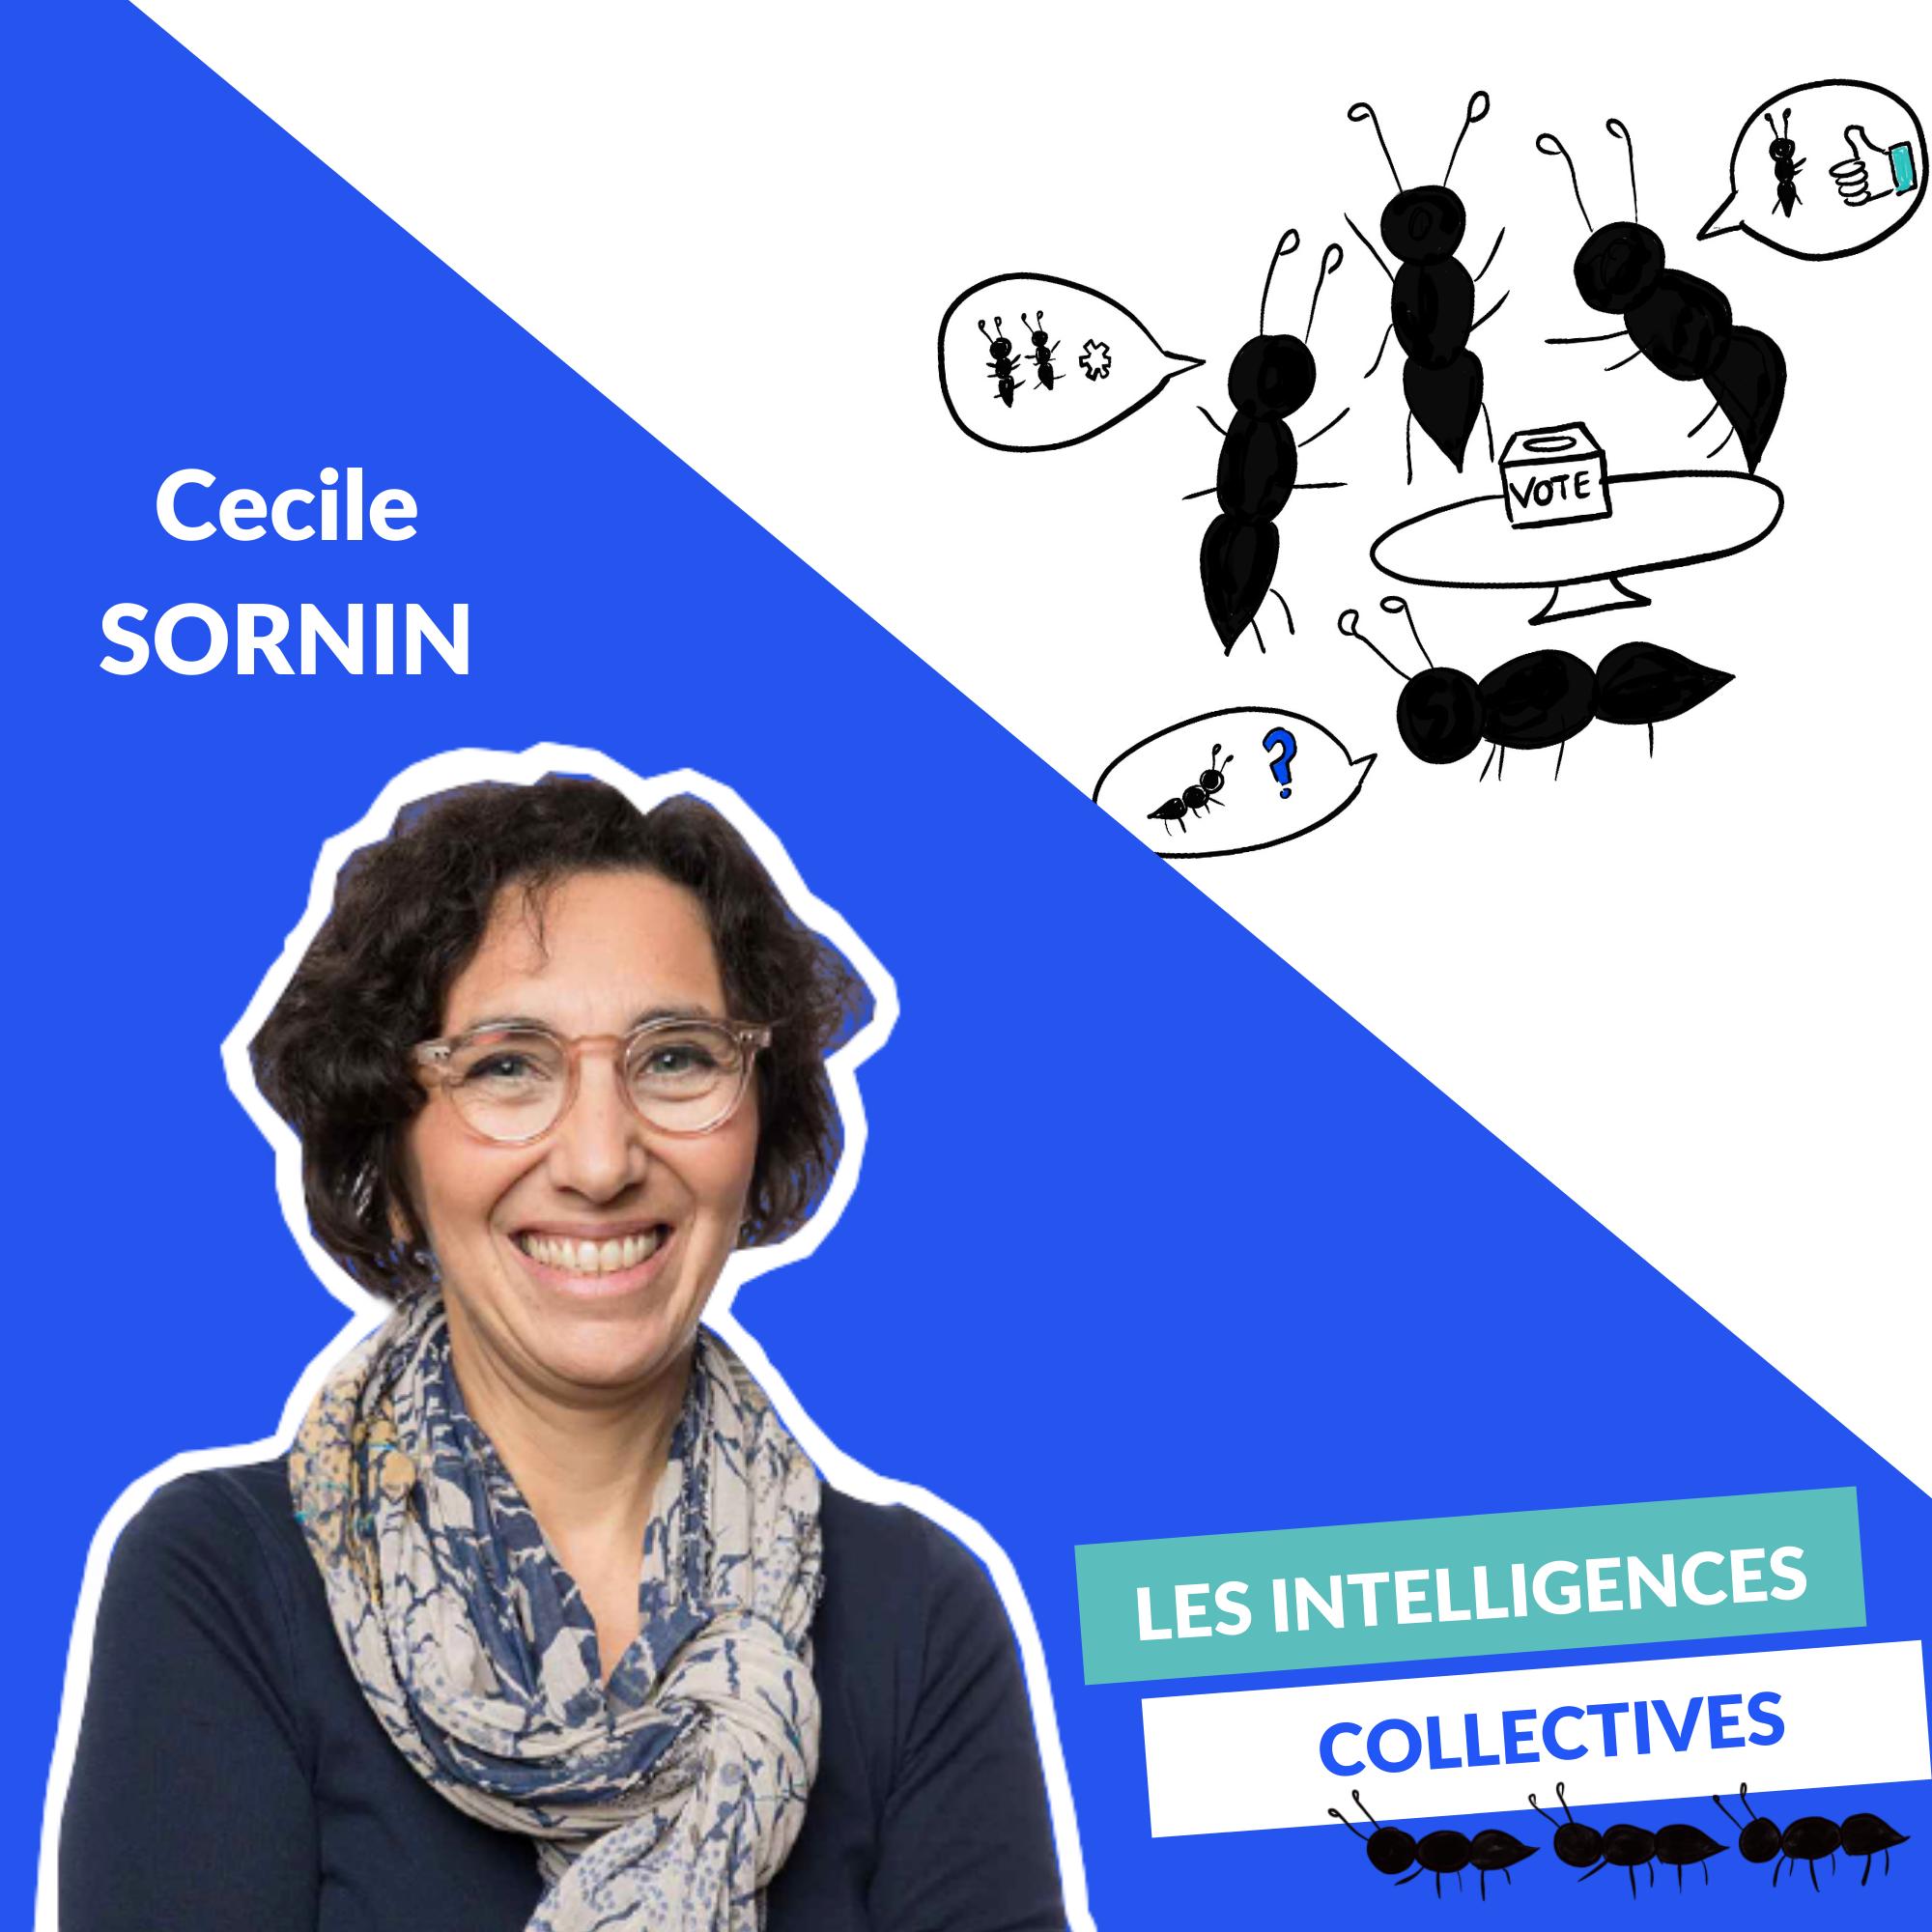 Cecile Sornin - Démocratie participative